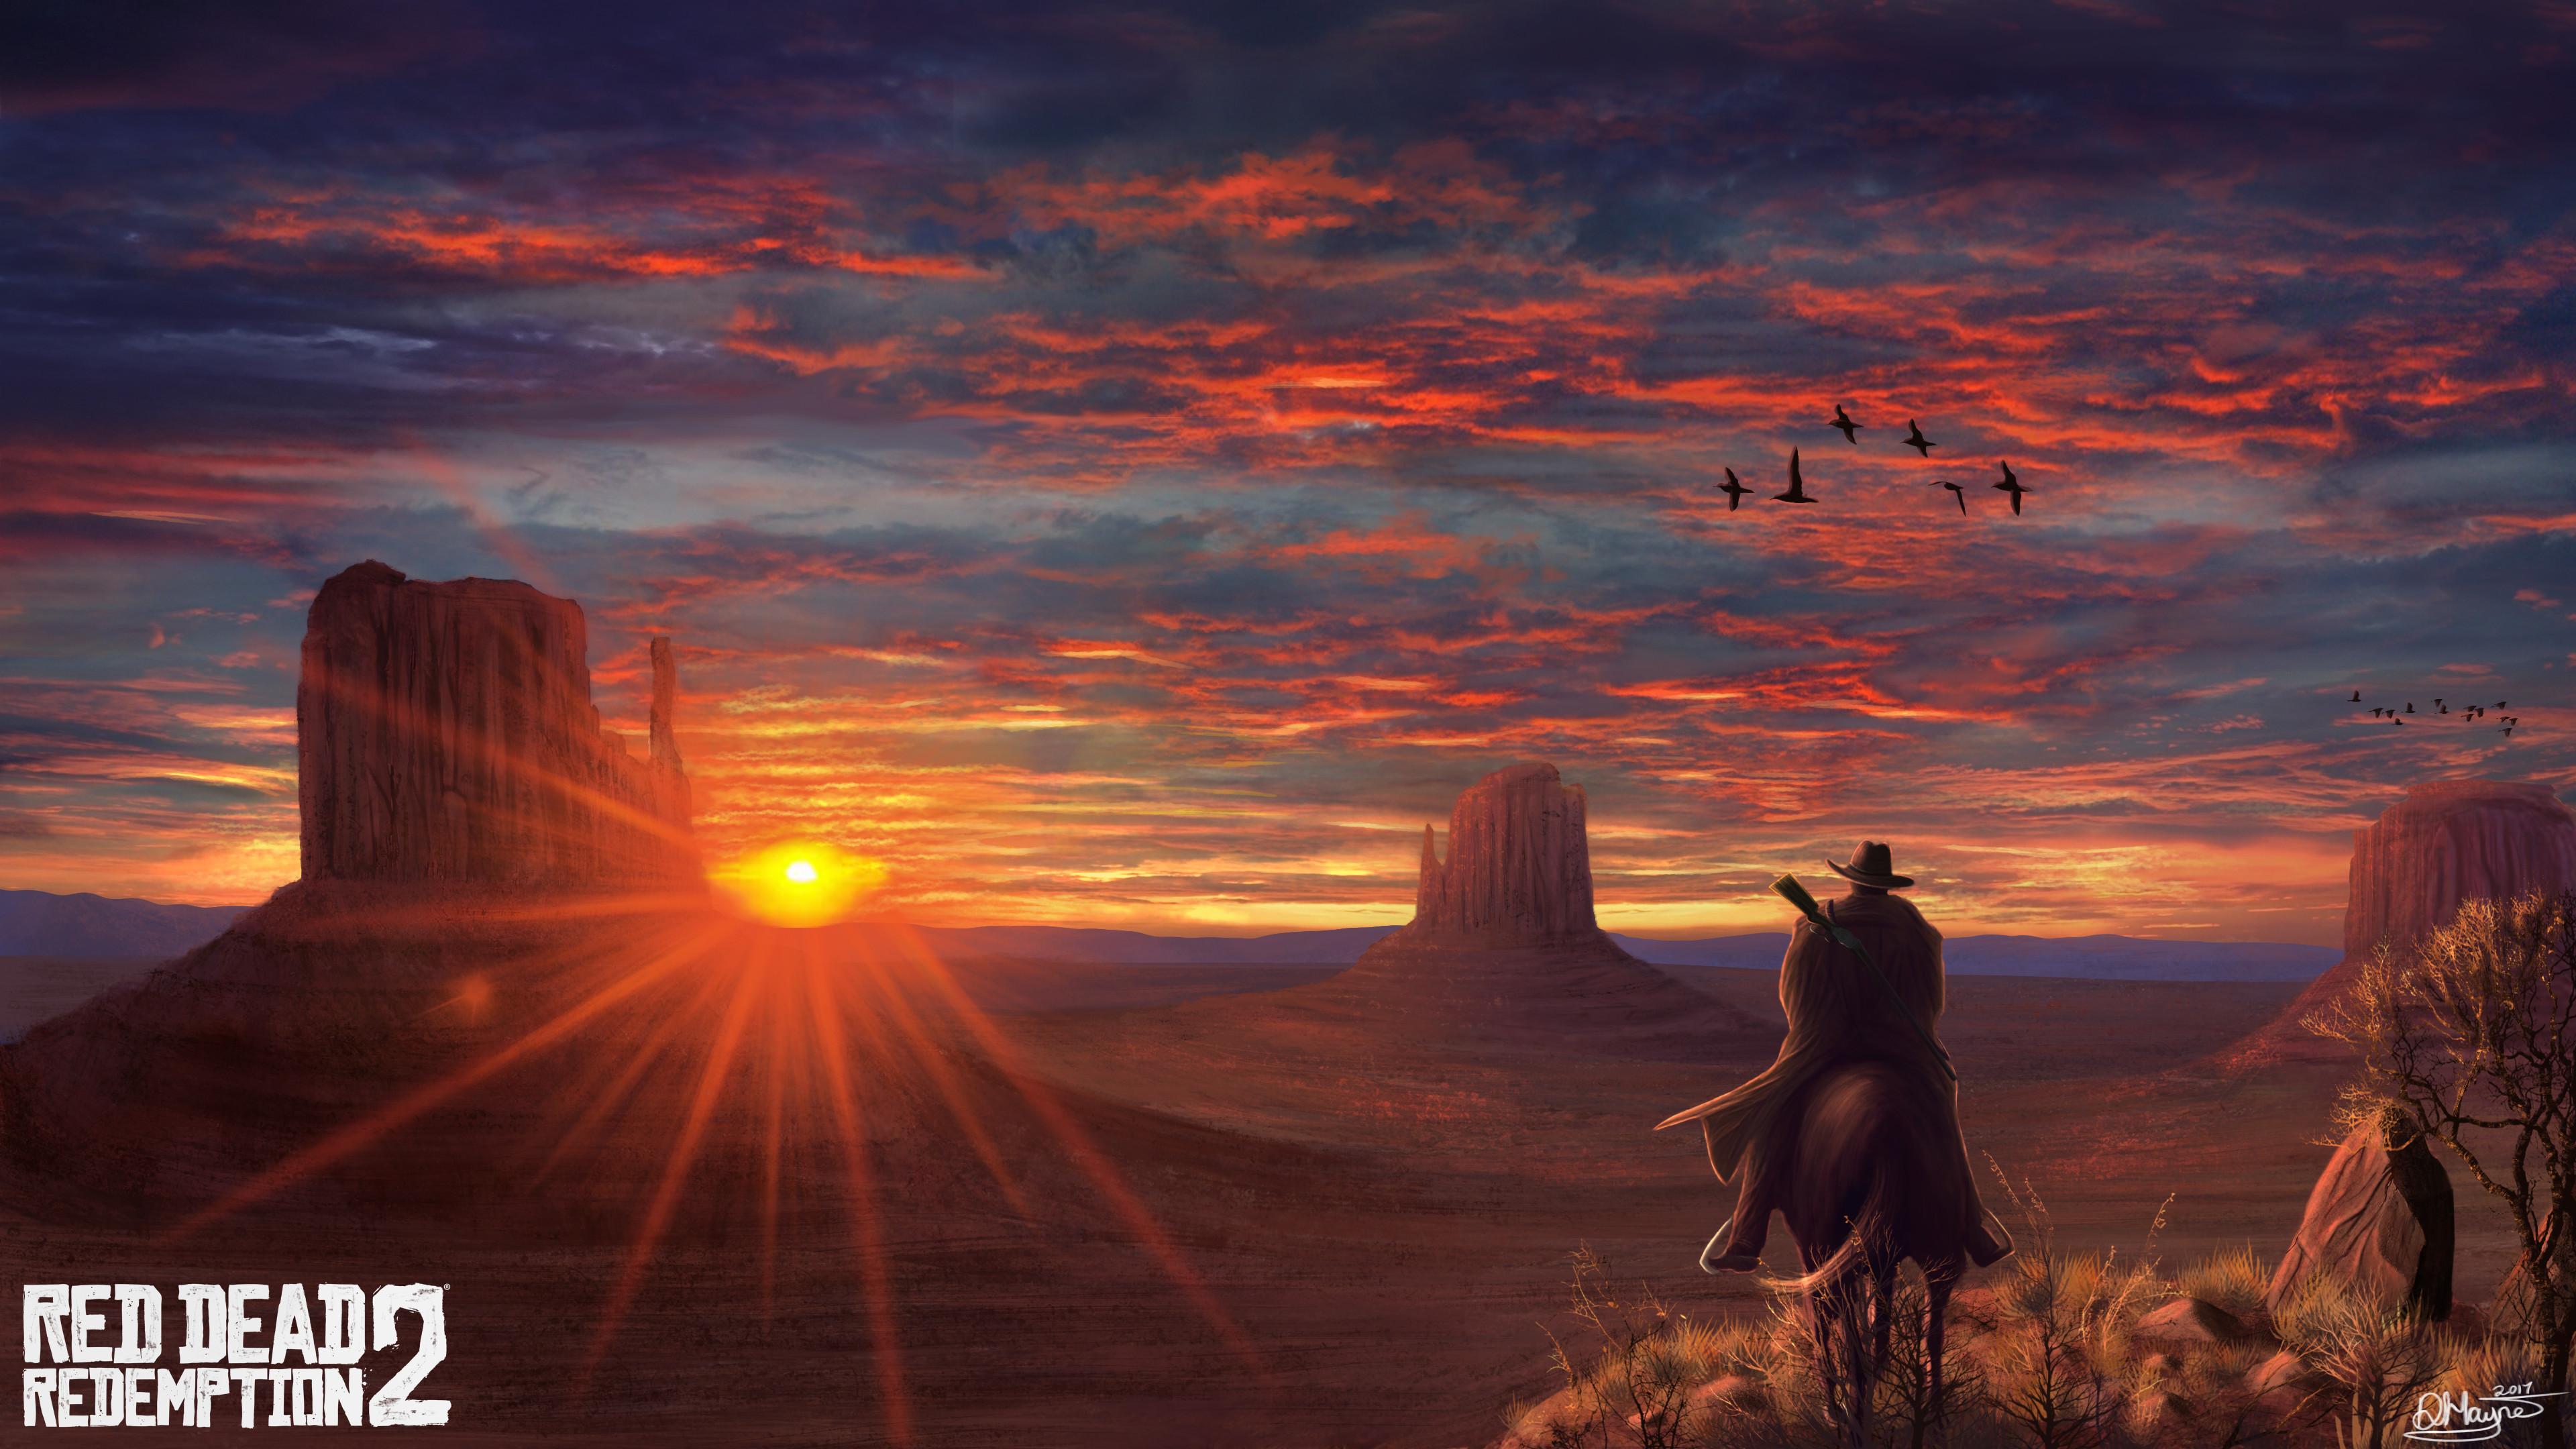 4k Wallpaper Fanart Pubattlegrounds: Red Dead Redemption 2 FanArt 4k, HD Games, 4k Wallpapers